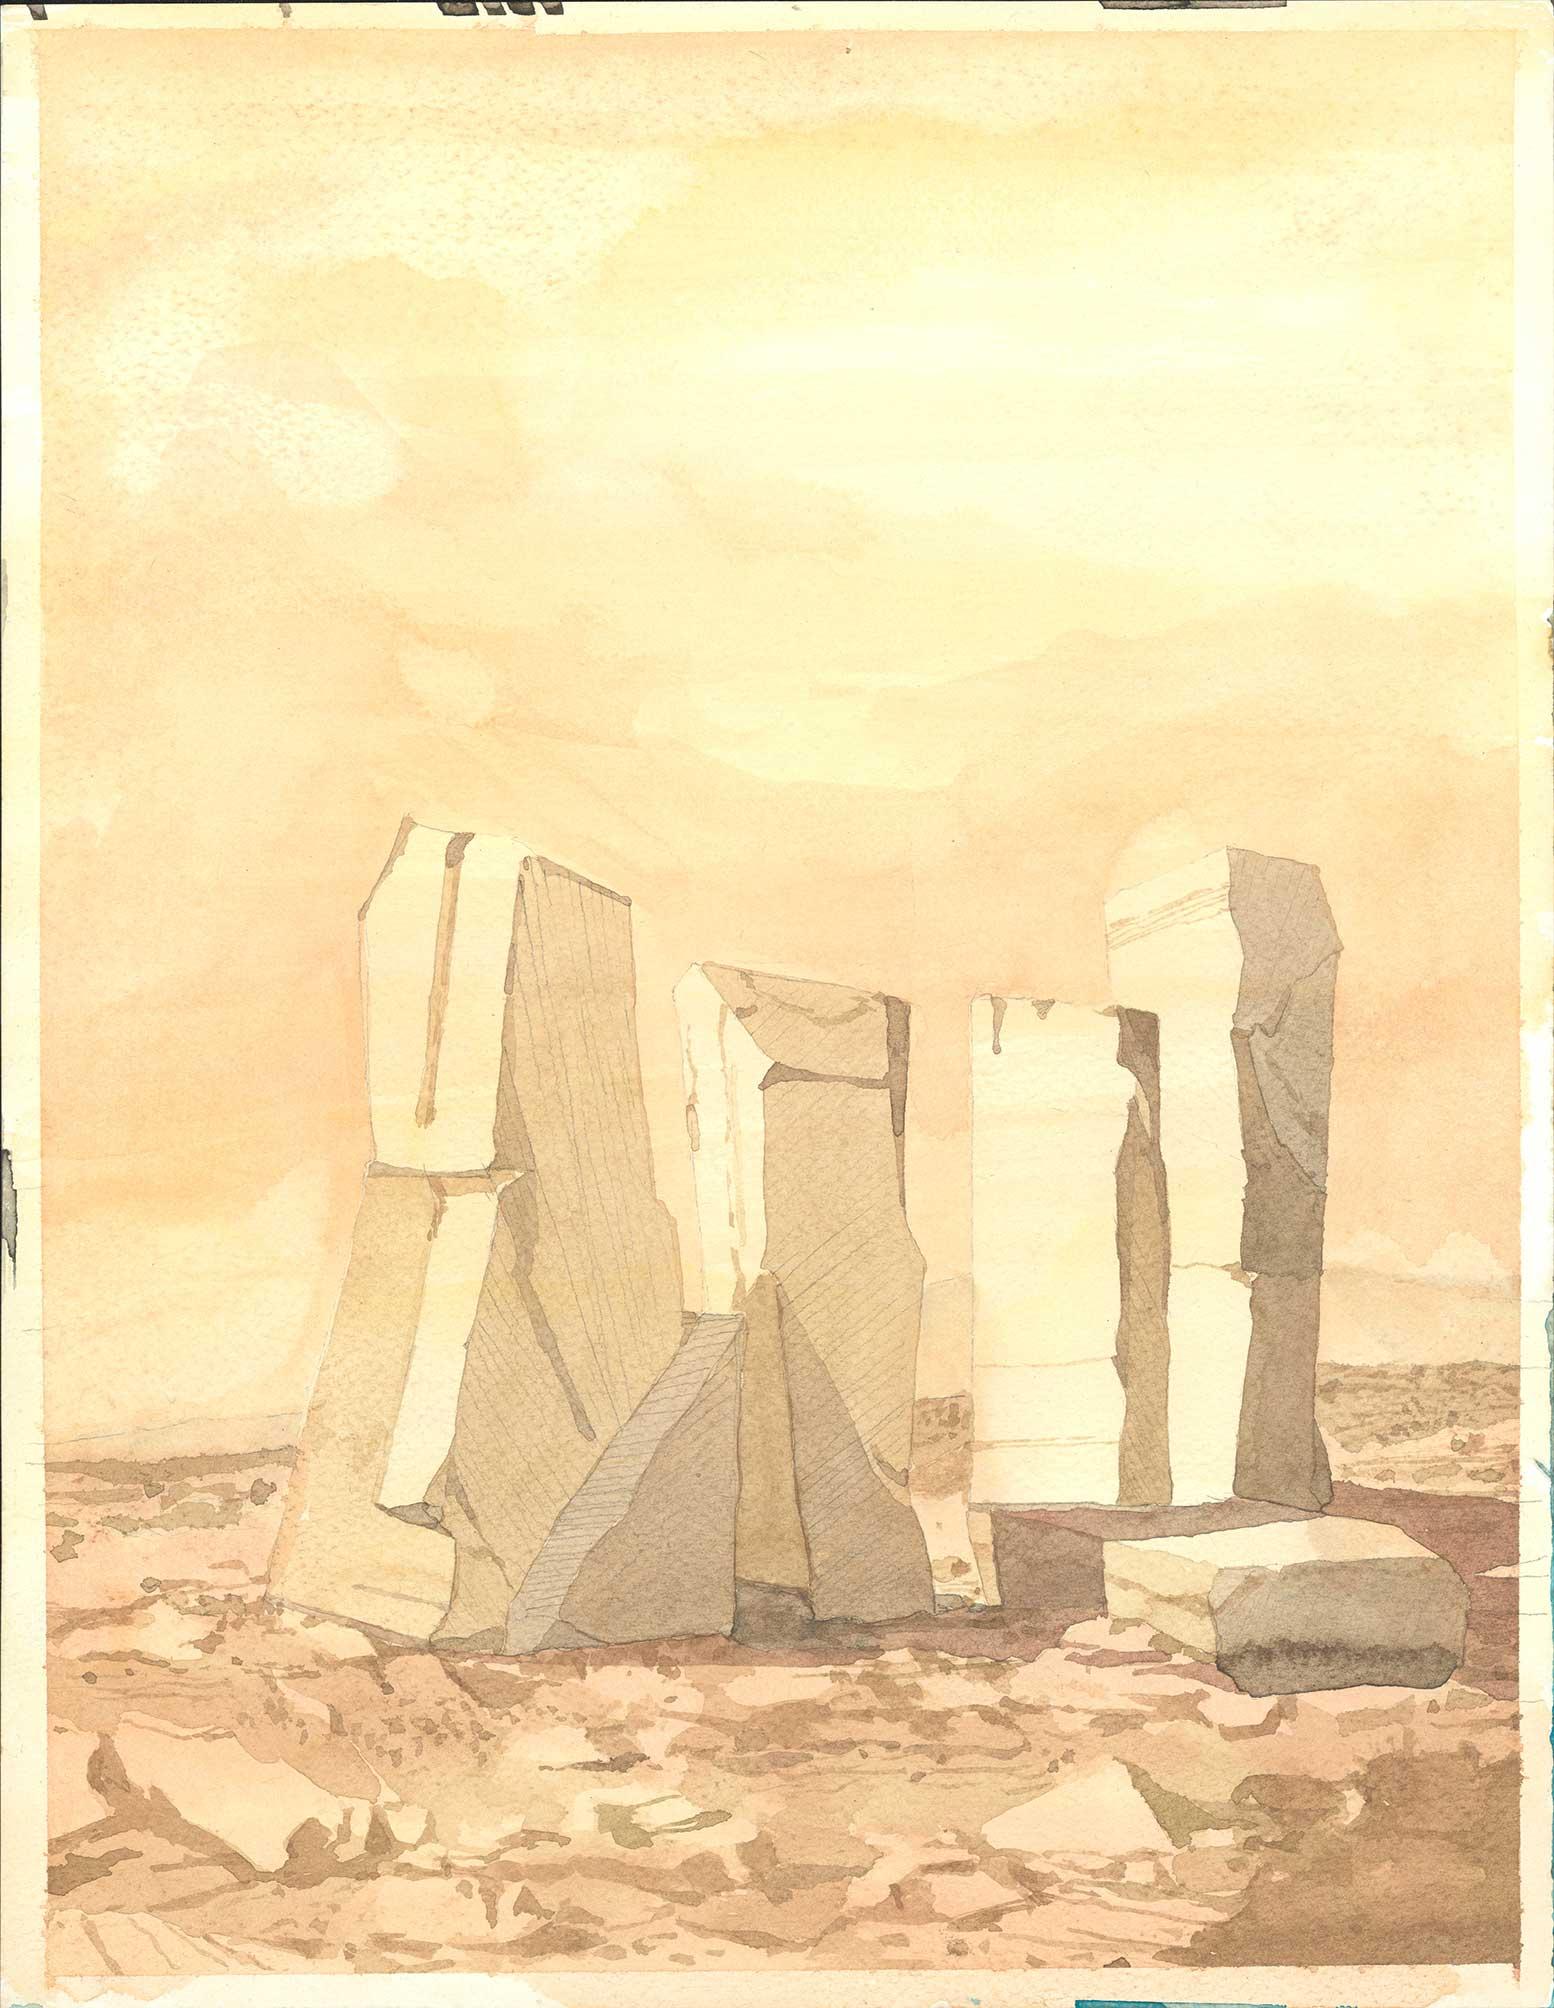 """a martian landscape"" Aquarell und Bleistift auf Papier 35 x 27 cm"